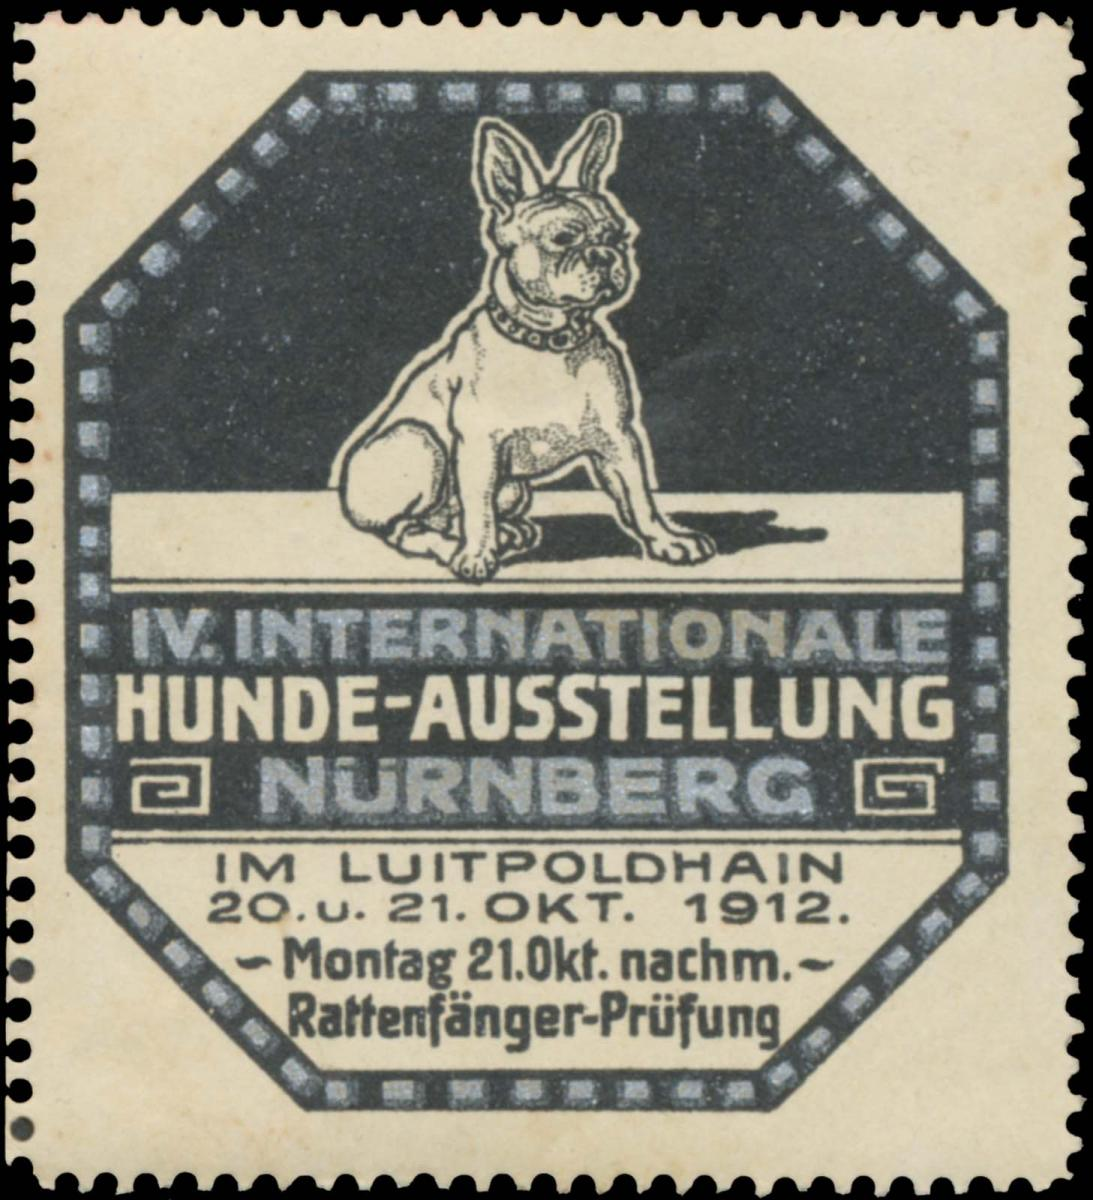 IV. Internationale Hunde-Ausstellung